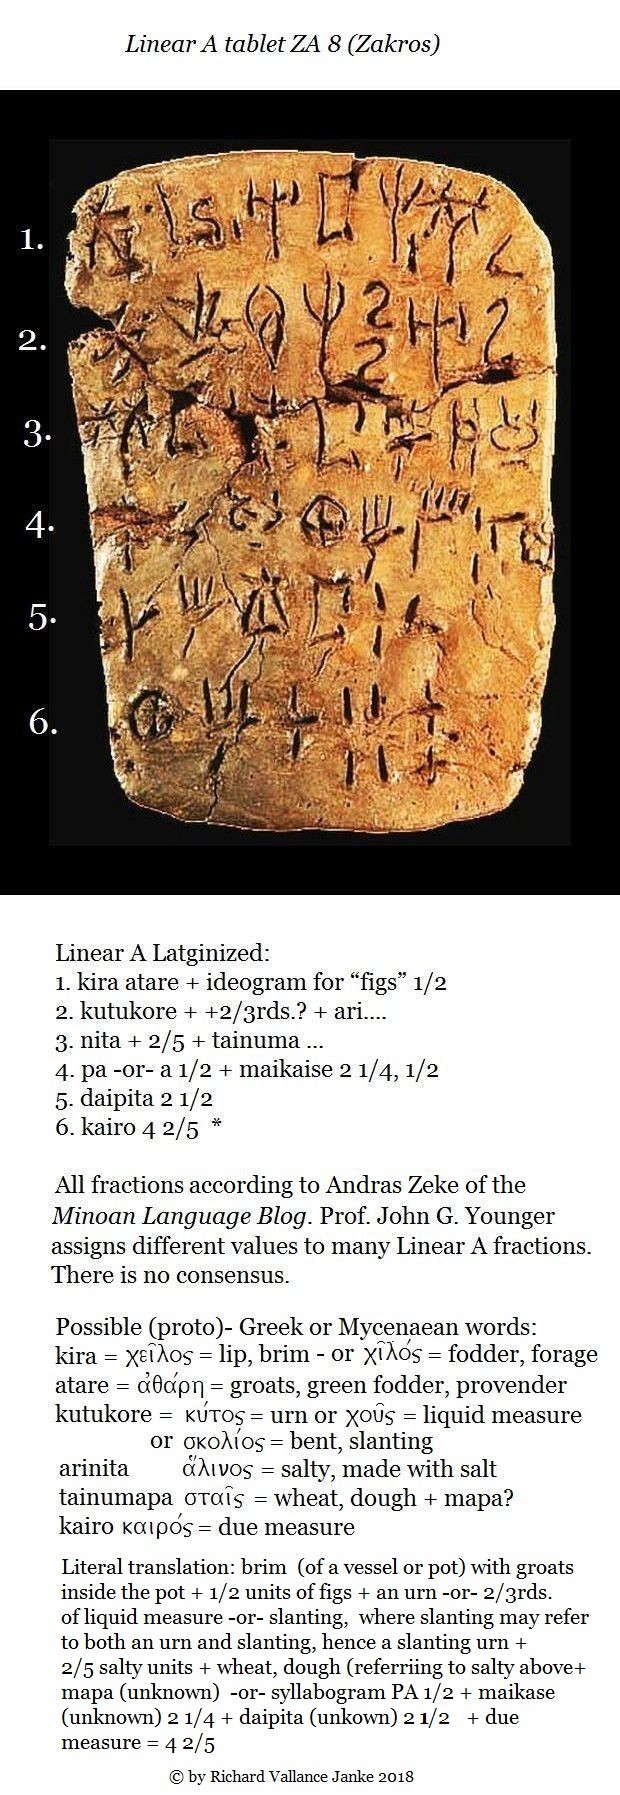 Linear A tablet ZA 8 Zakros